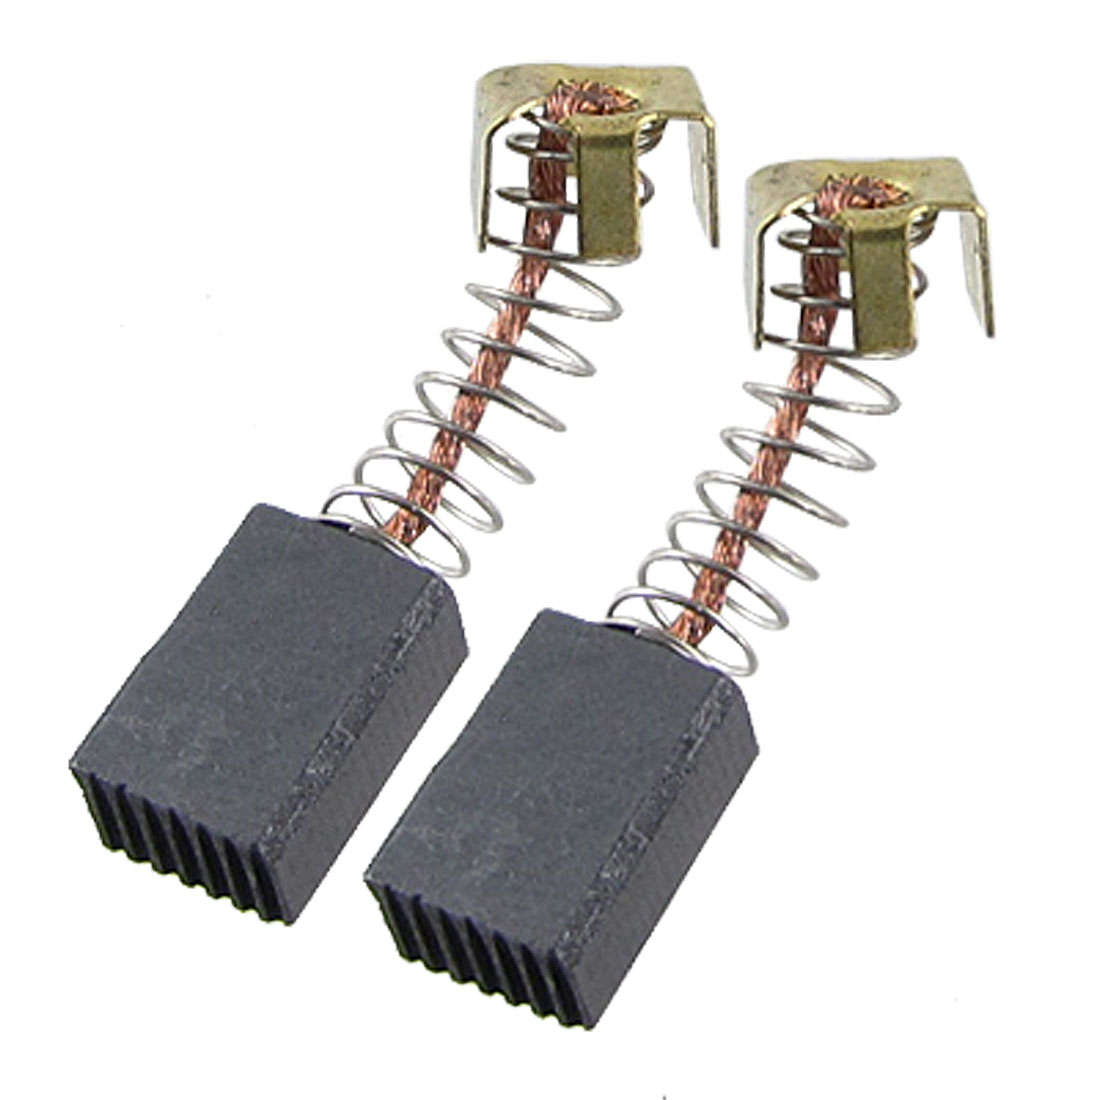 "8 Pcs Power Tools Parts Carbon Brush 27/64"" x 5/16"" x 1/5"""